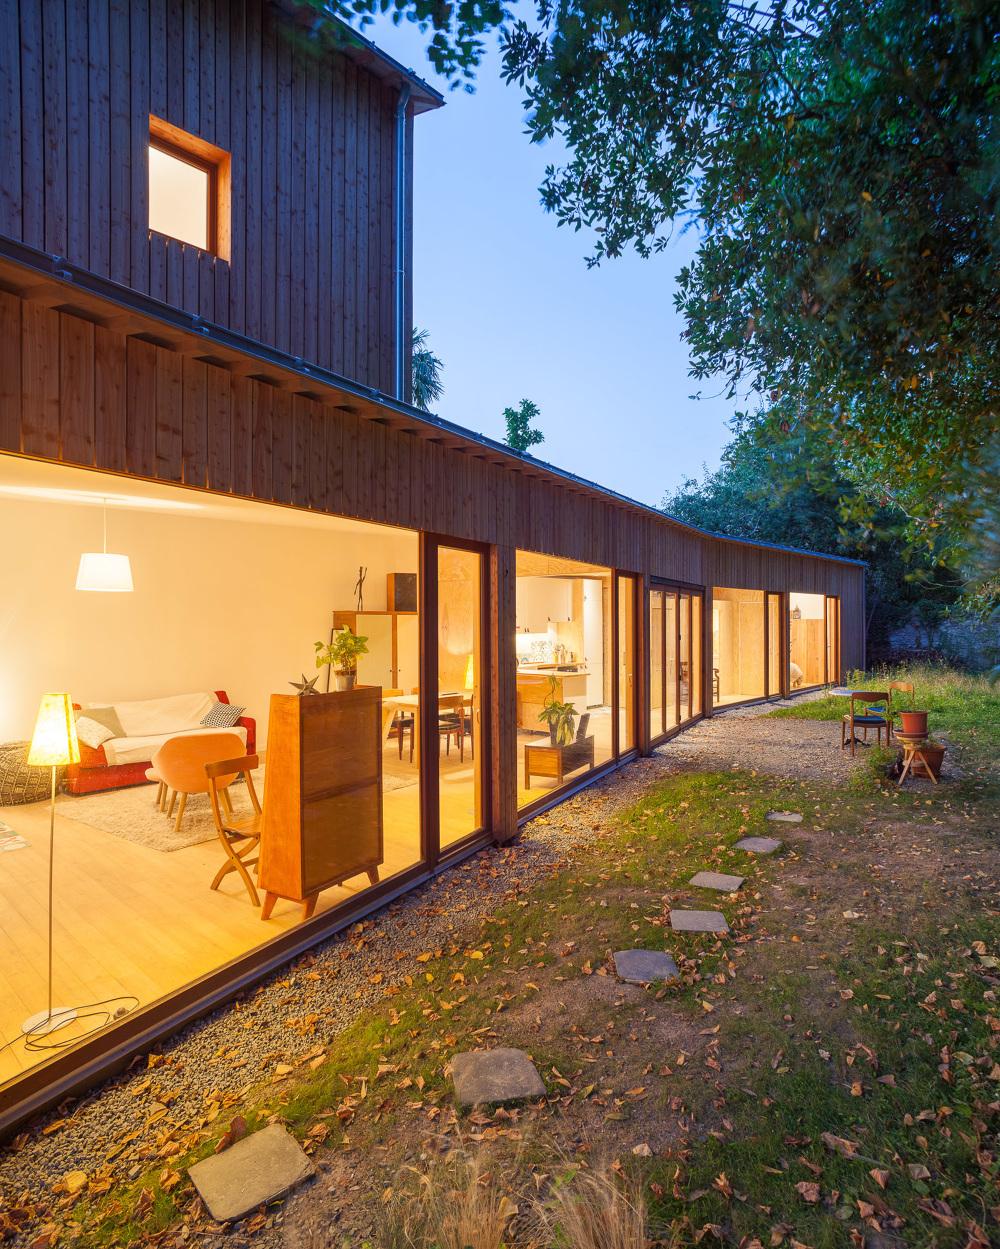 maison hm agence mfa nantes 44 fran ois dantart photographe d 39 architecture. Black Bedroom Furniture Sets. Home Design Ideas